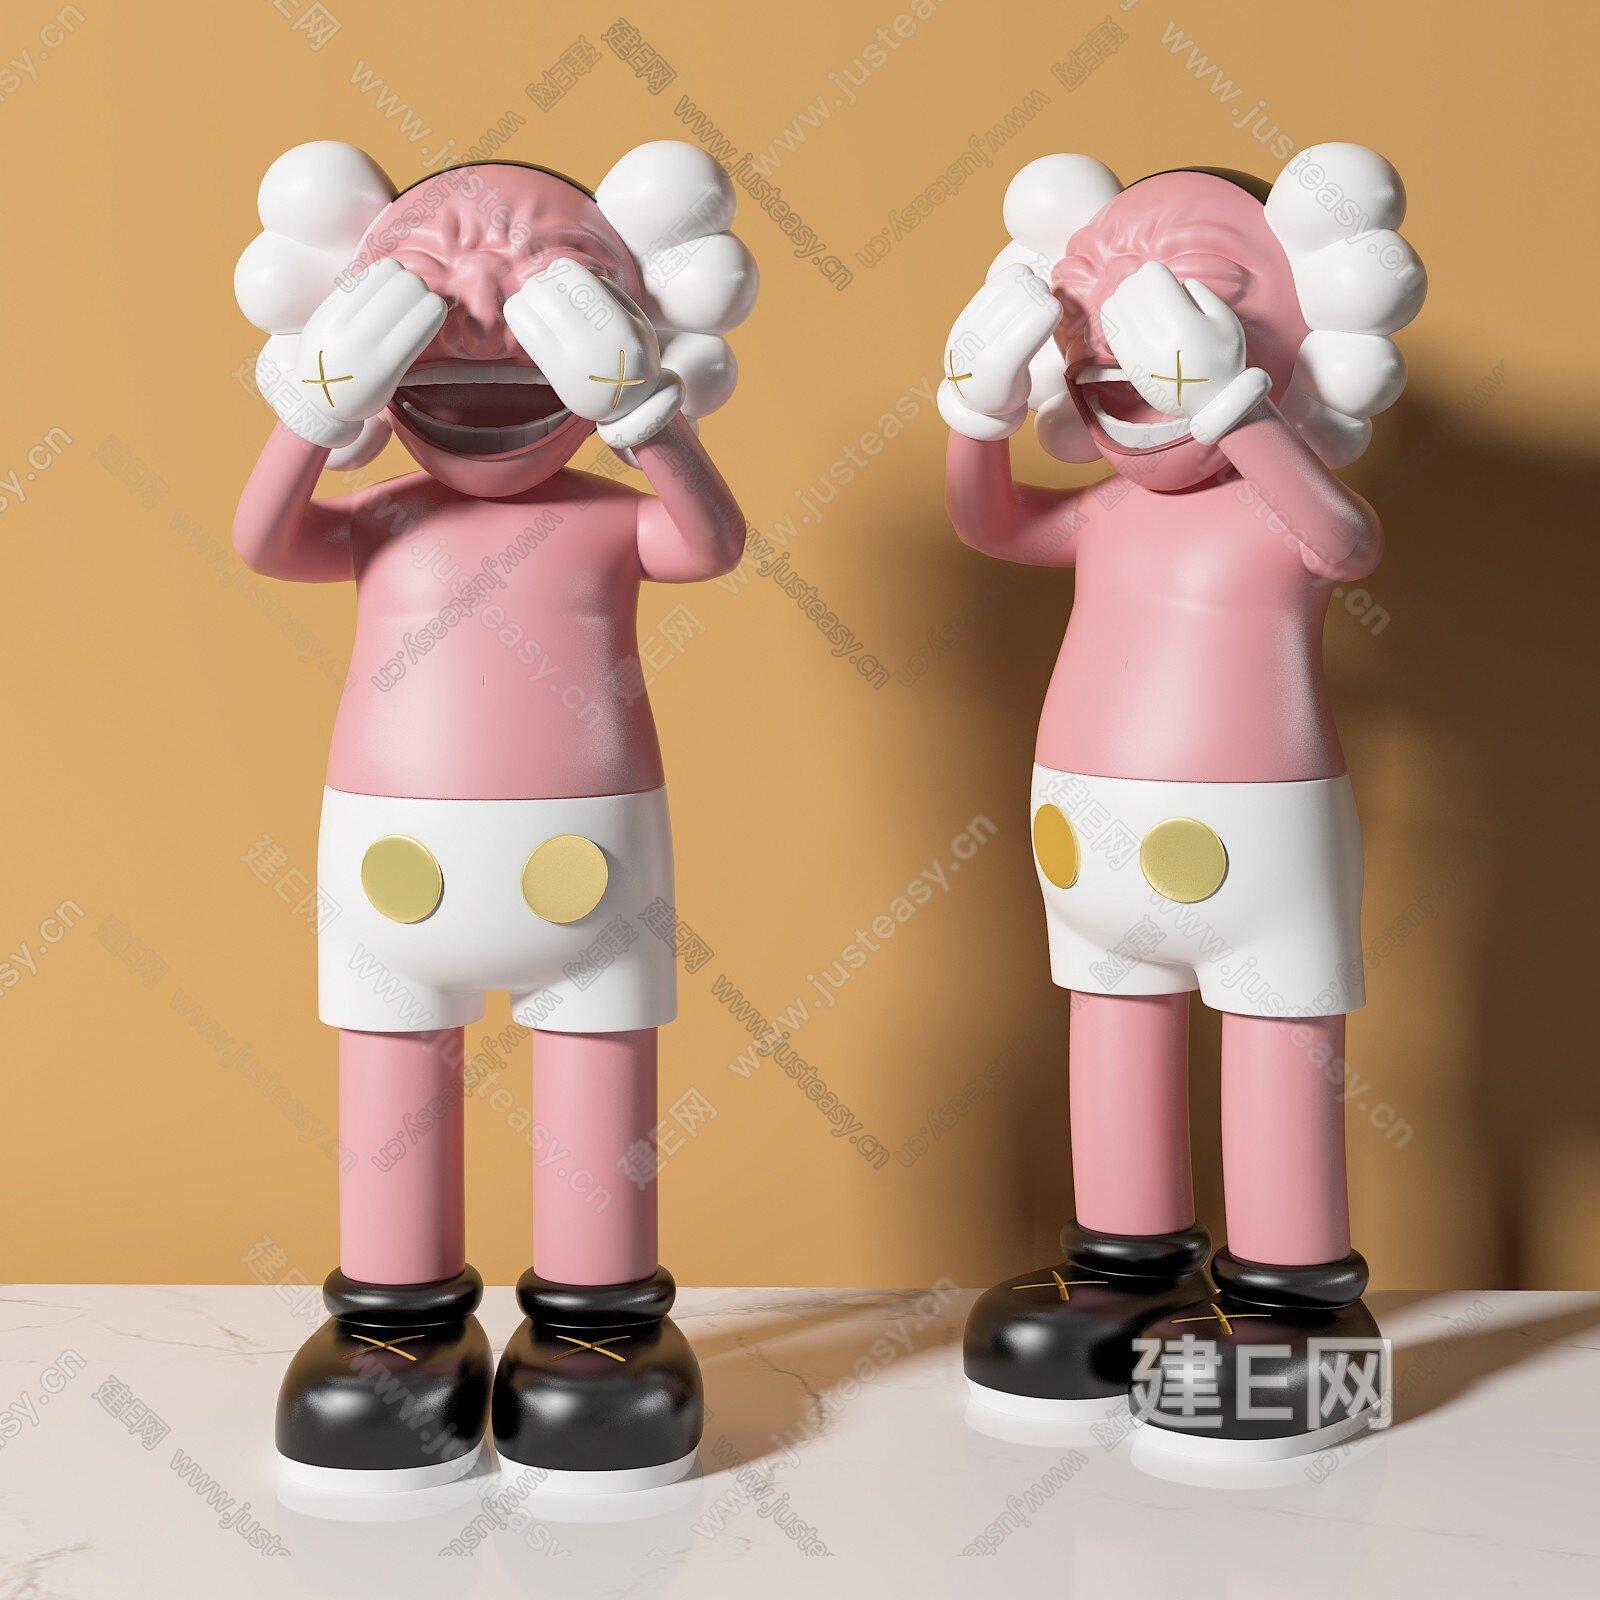 kaws 现代雕塑3d模型